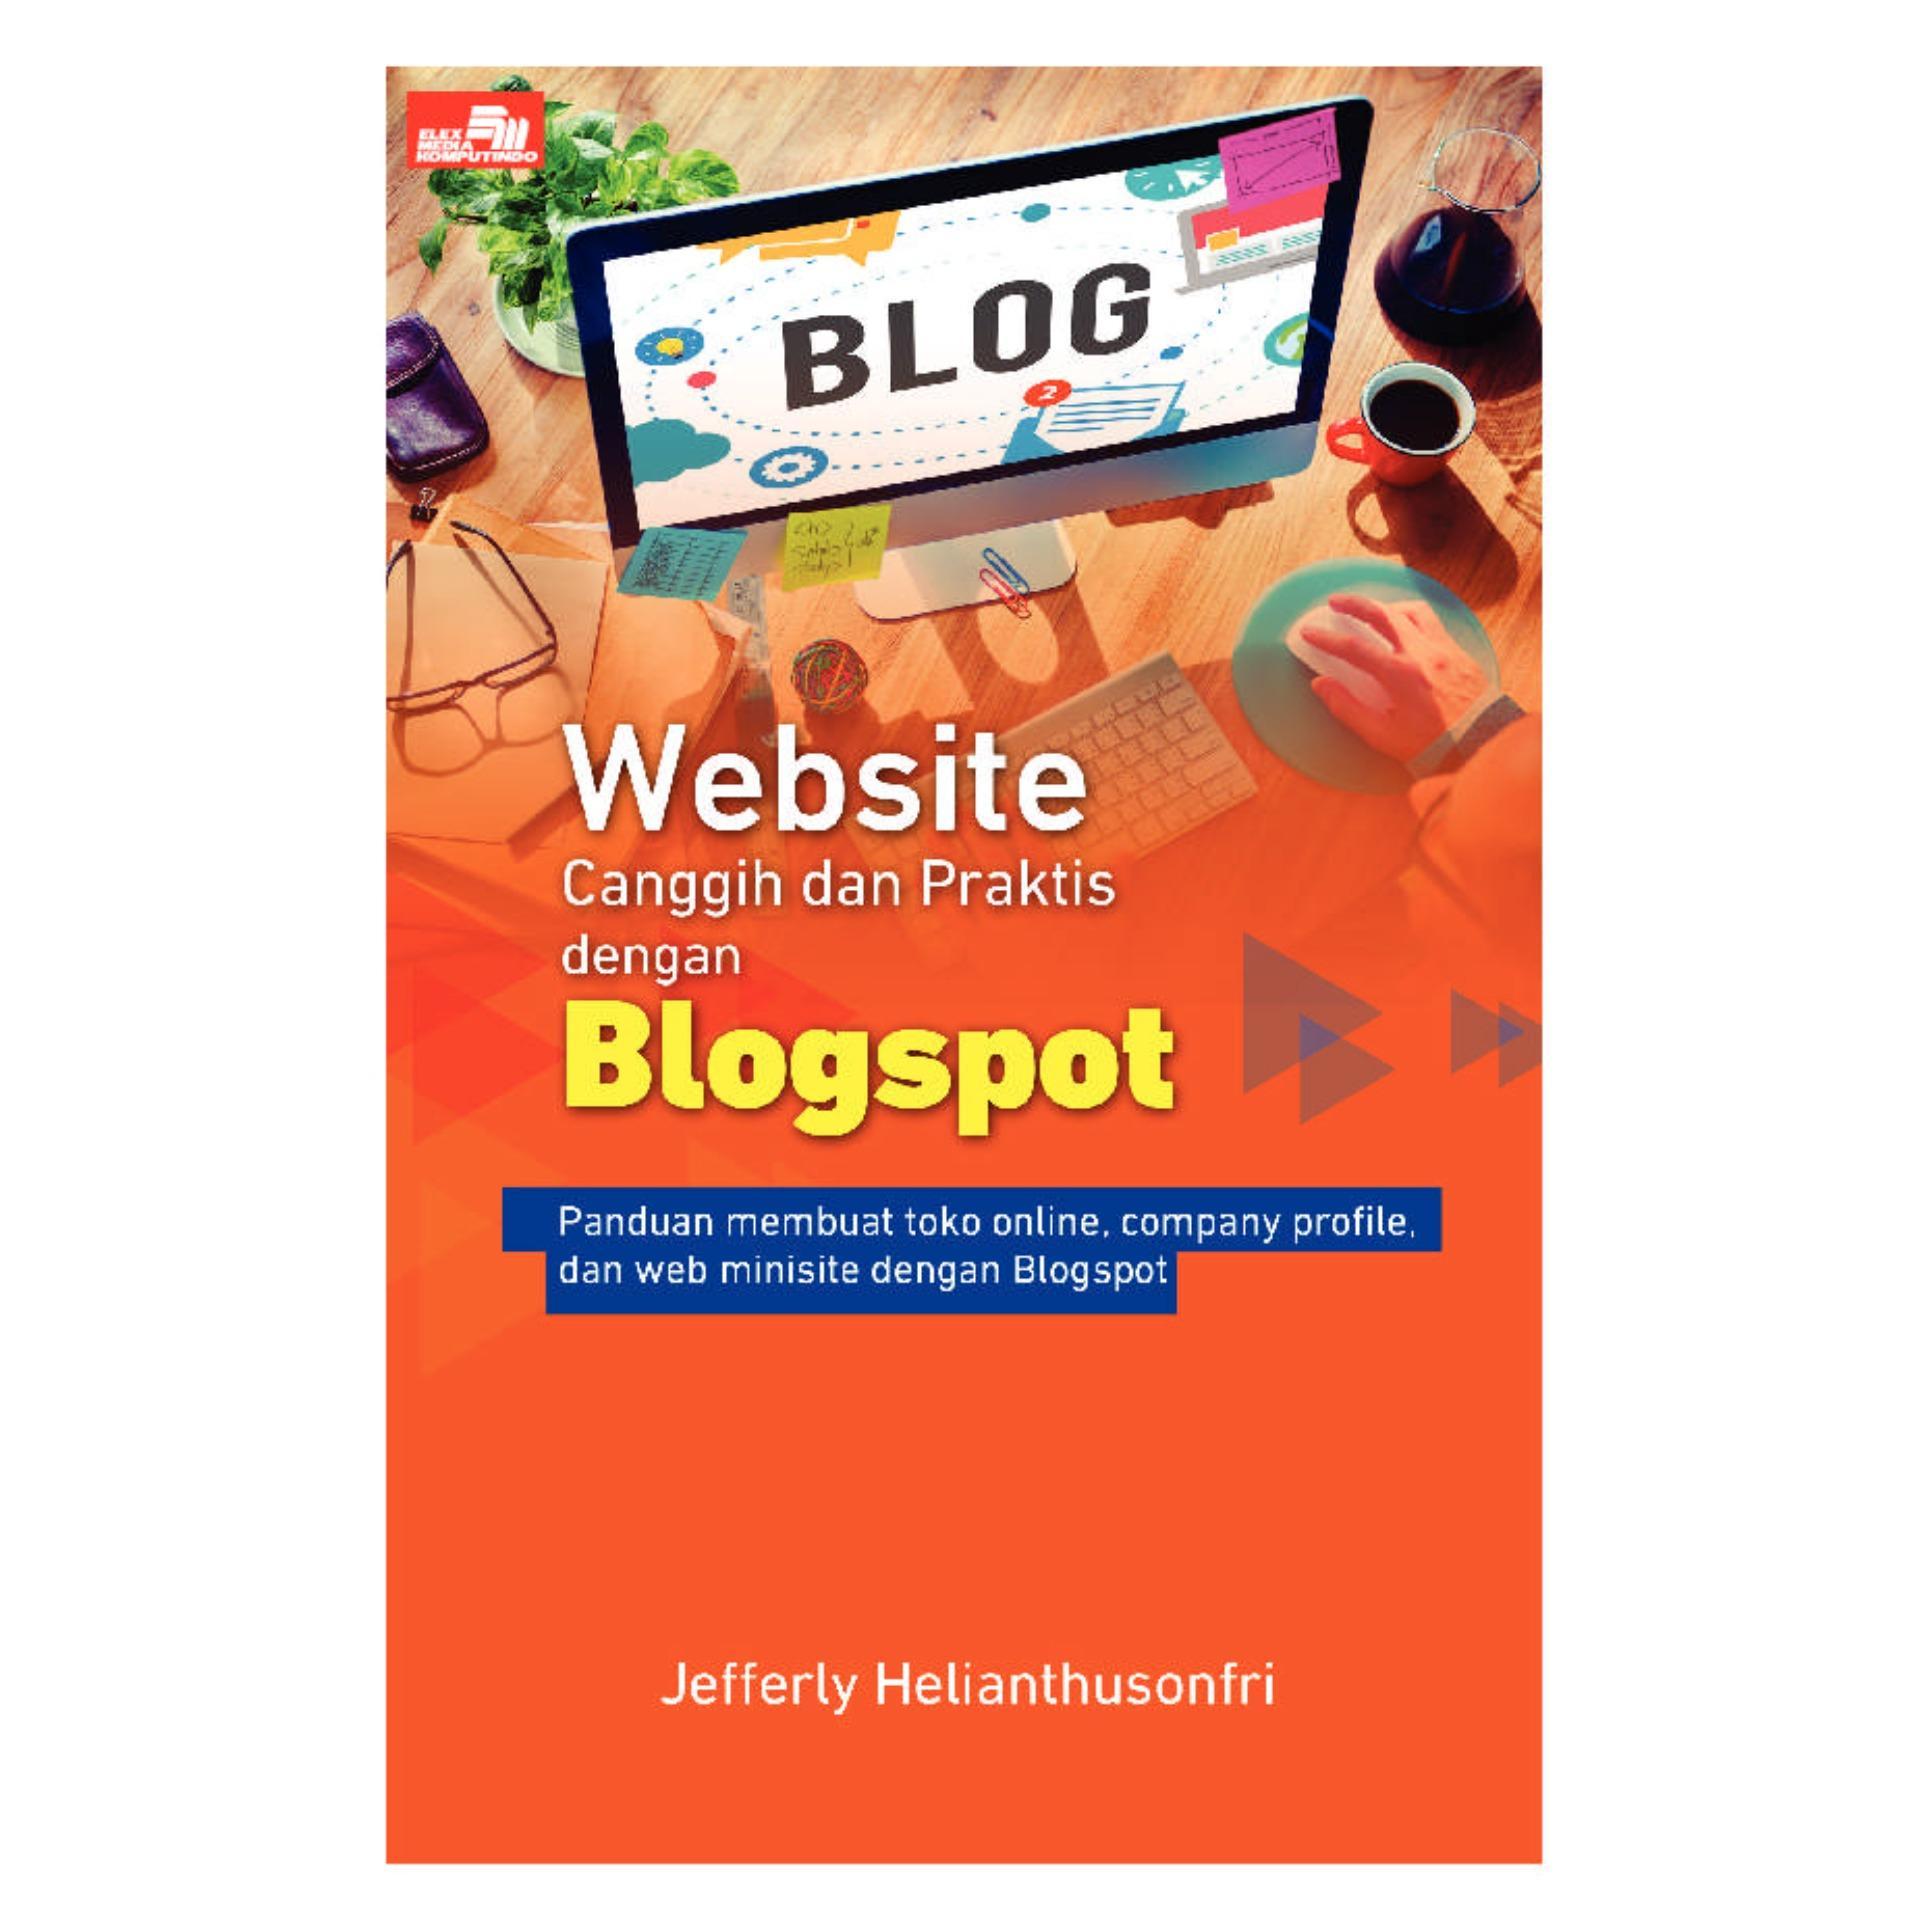 Website Canggih Dan Praktis Dengan Blogspot By Serba Serbi.